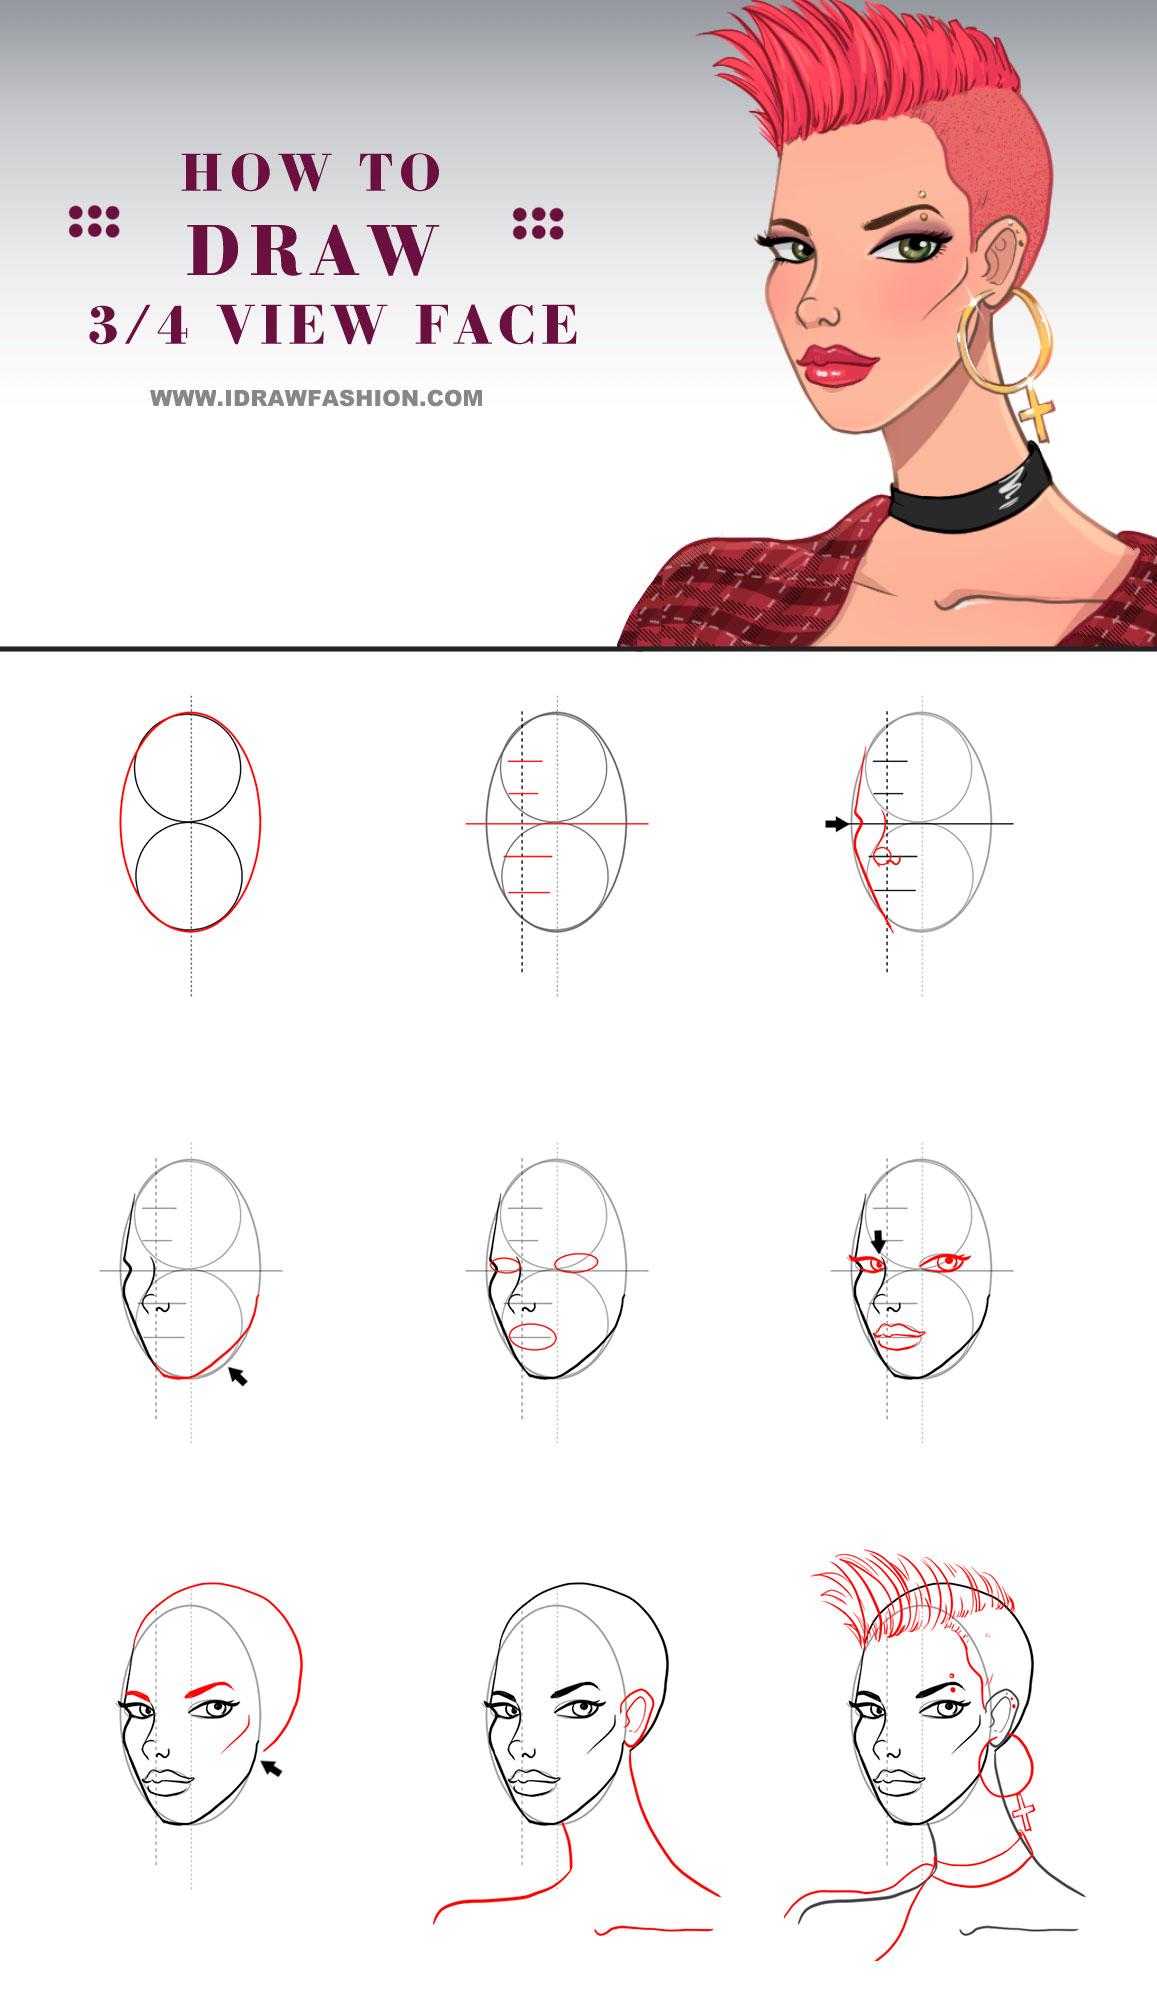 1157x2016 Draw A 34 View Face I Draw Fashion